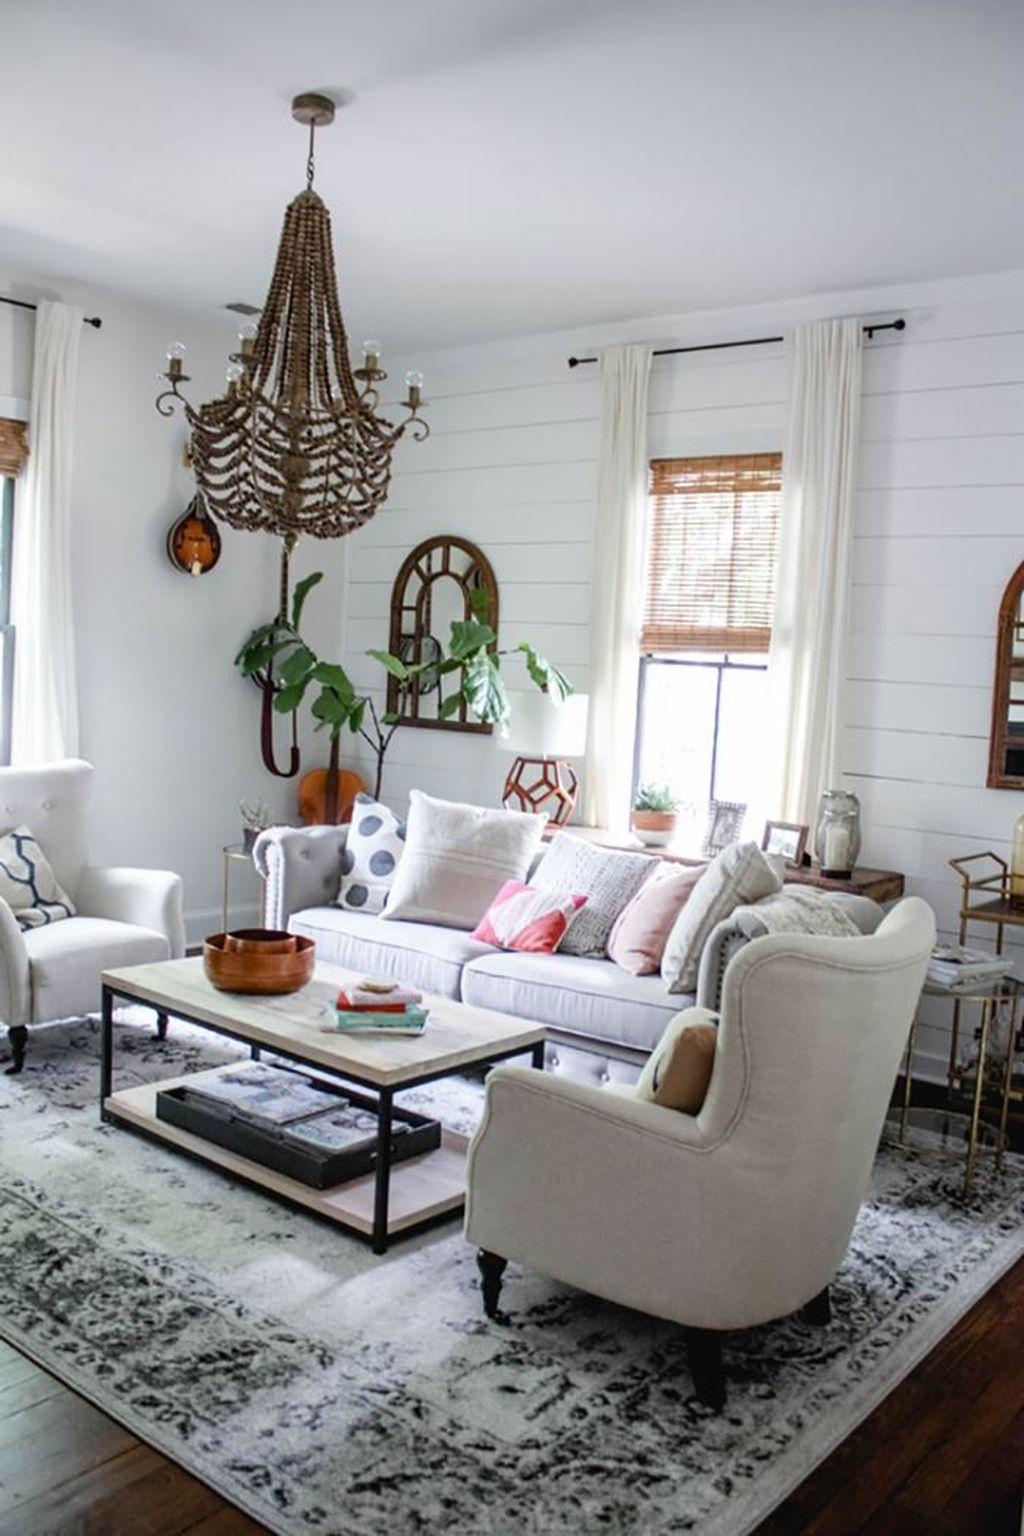 Amazing Bohemian Farmhouse Living Room Design Ideas 25